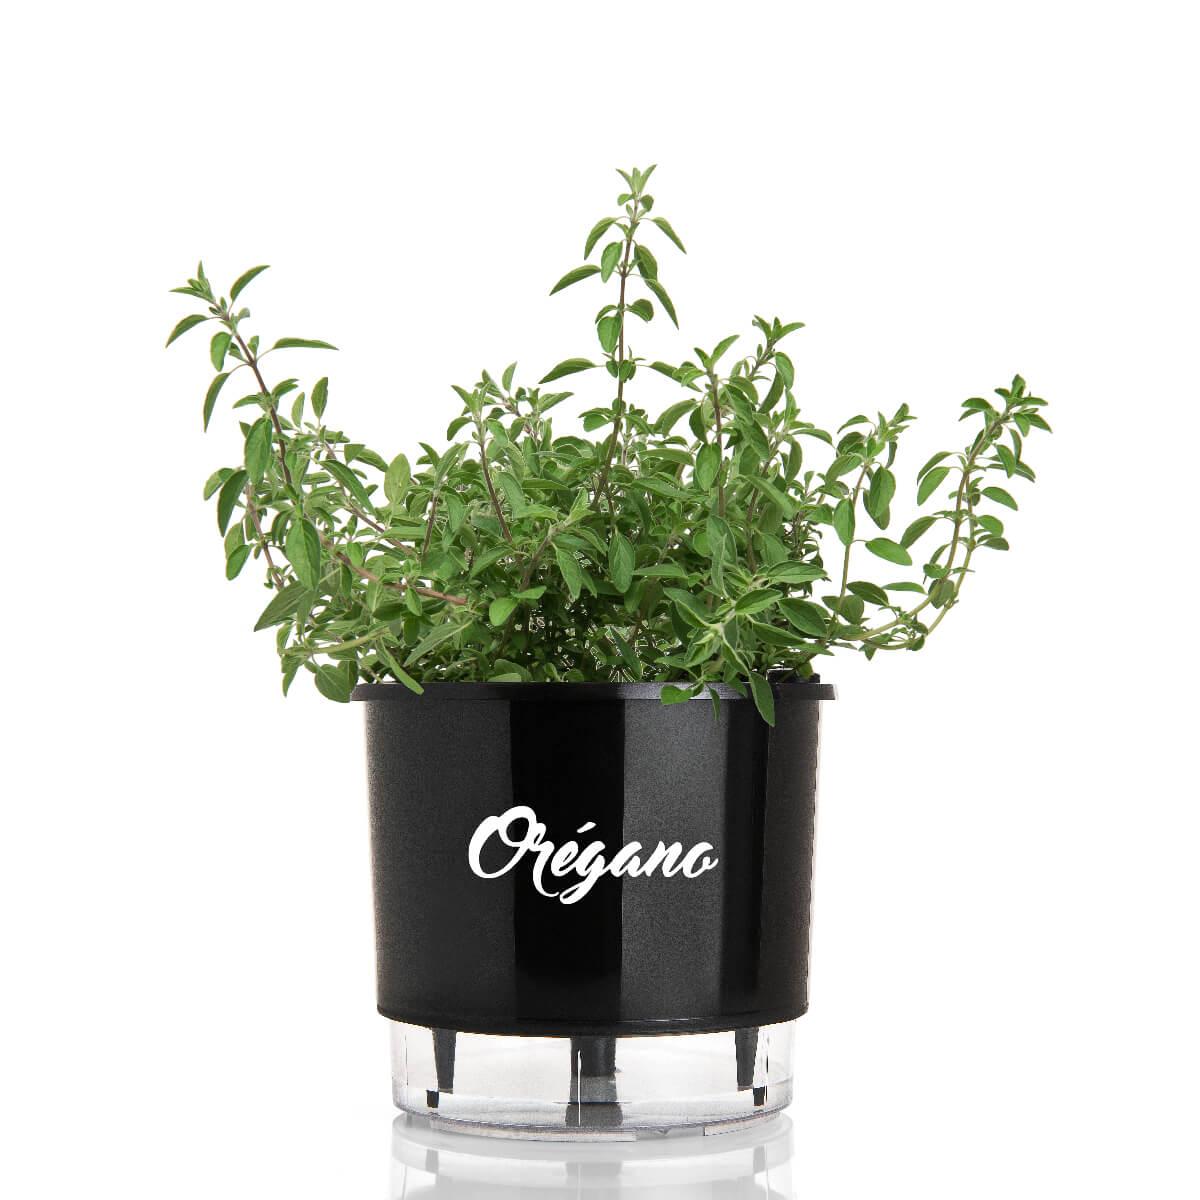 Vaso Autoirrigável Médio Preto Coleção Gourmet 16cm x 14cm Orégano  - Vasos Raiz Loja Oficial